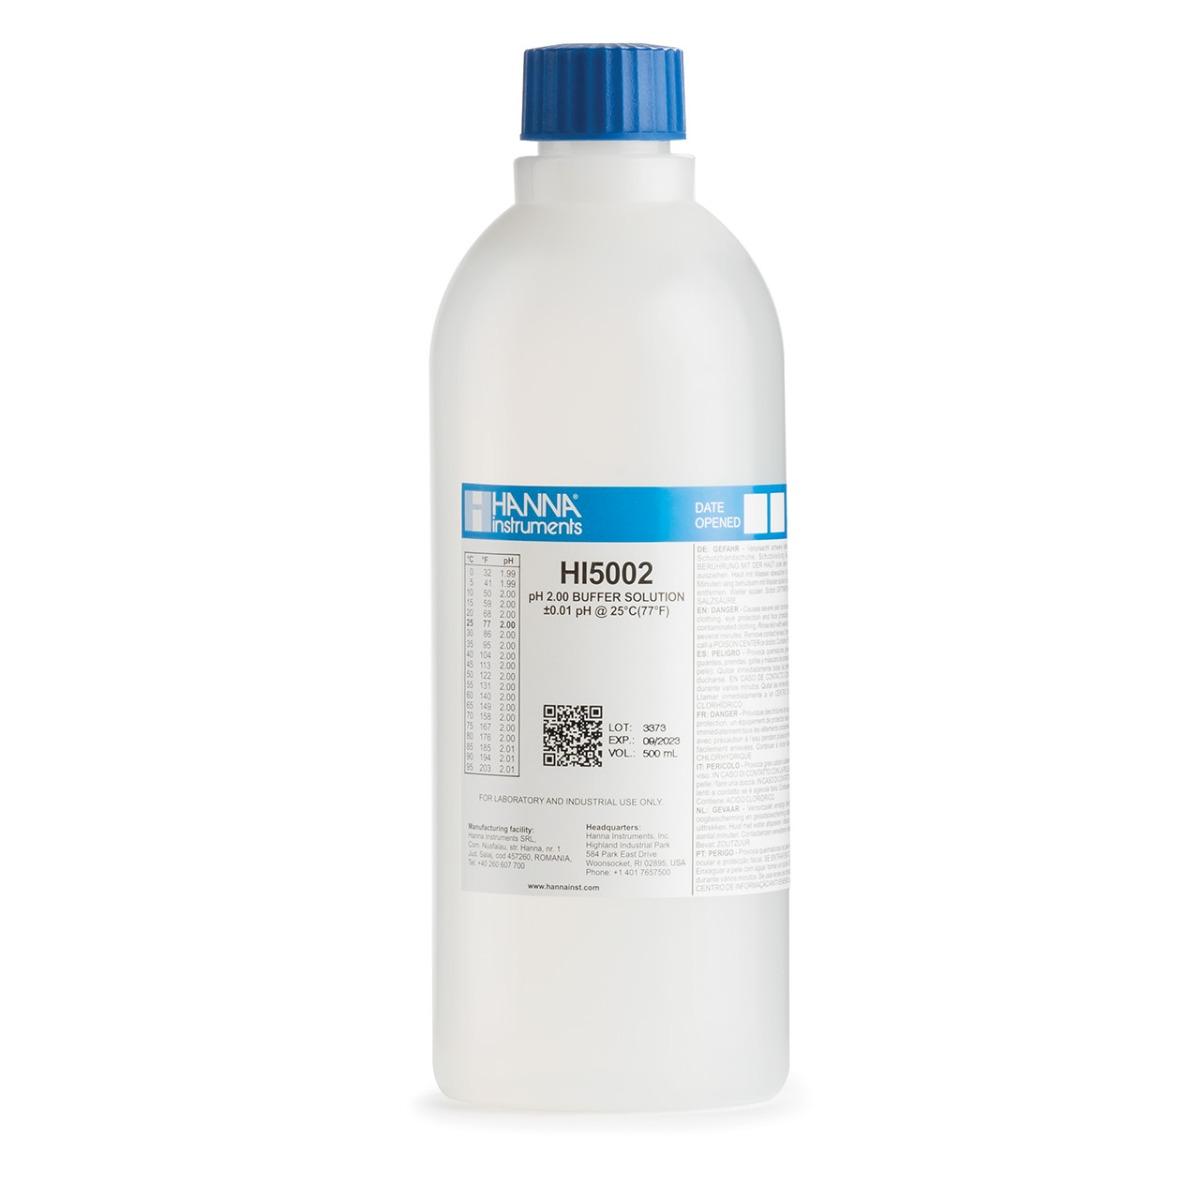 pH 2.00 technical calibration buffer